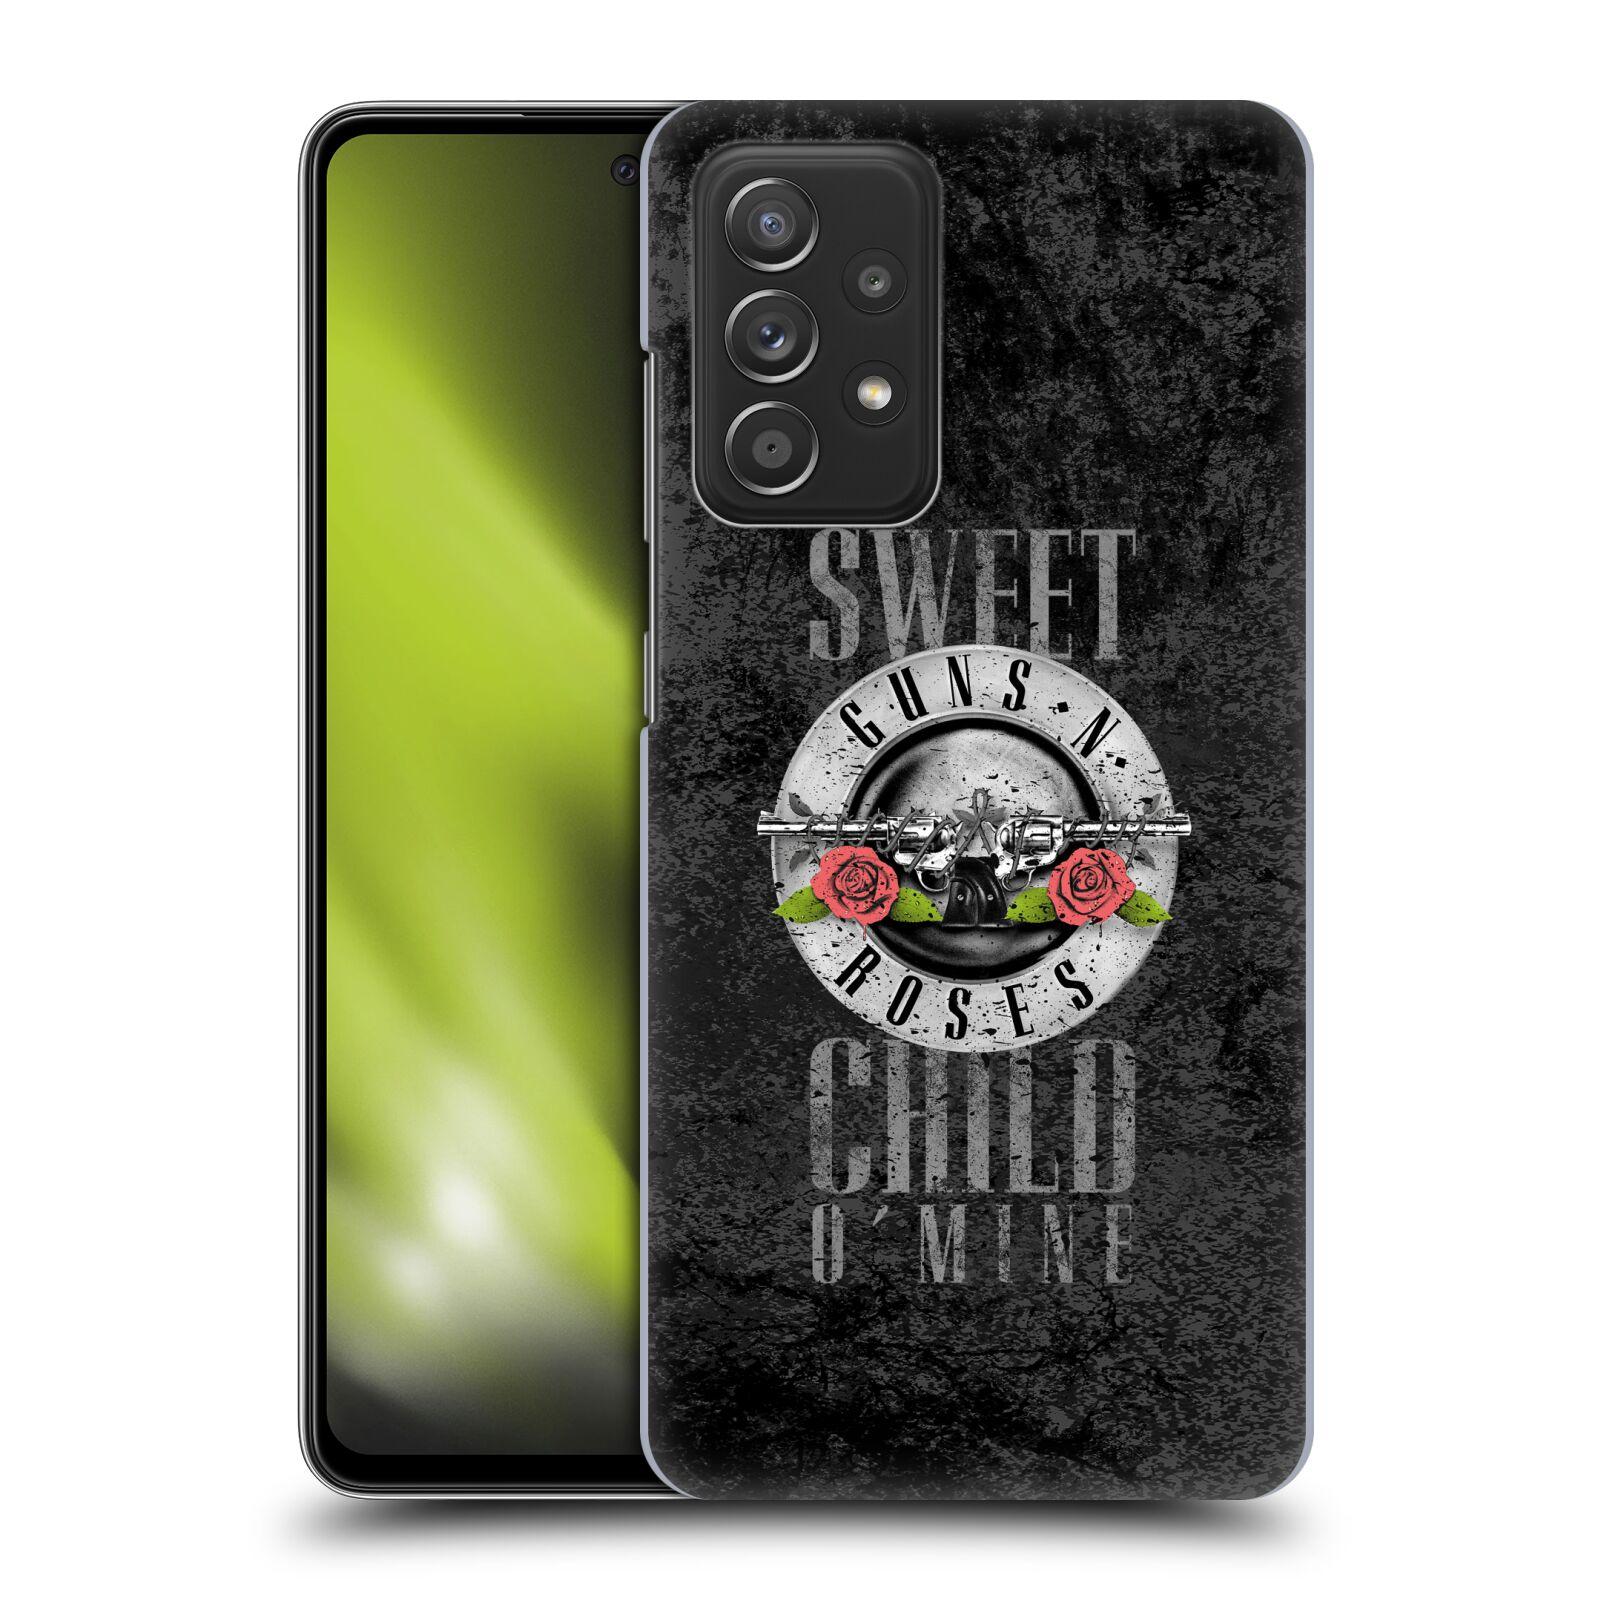 Plastové pouzdro na mobil Samsung Galaxy A52 / A52 5G / A52s 5G - Head Case - Guns N' Roses - Sweet Child